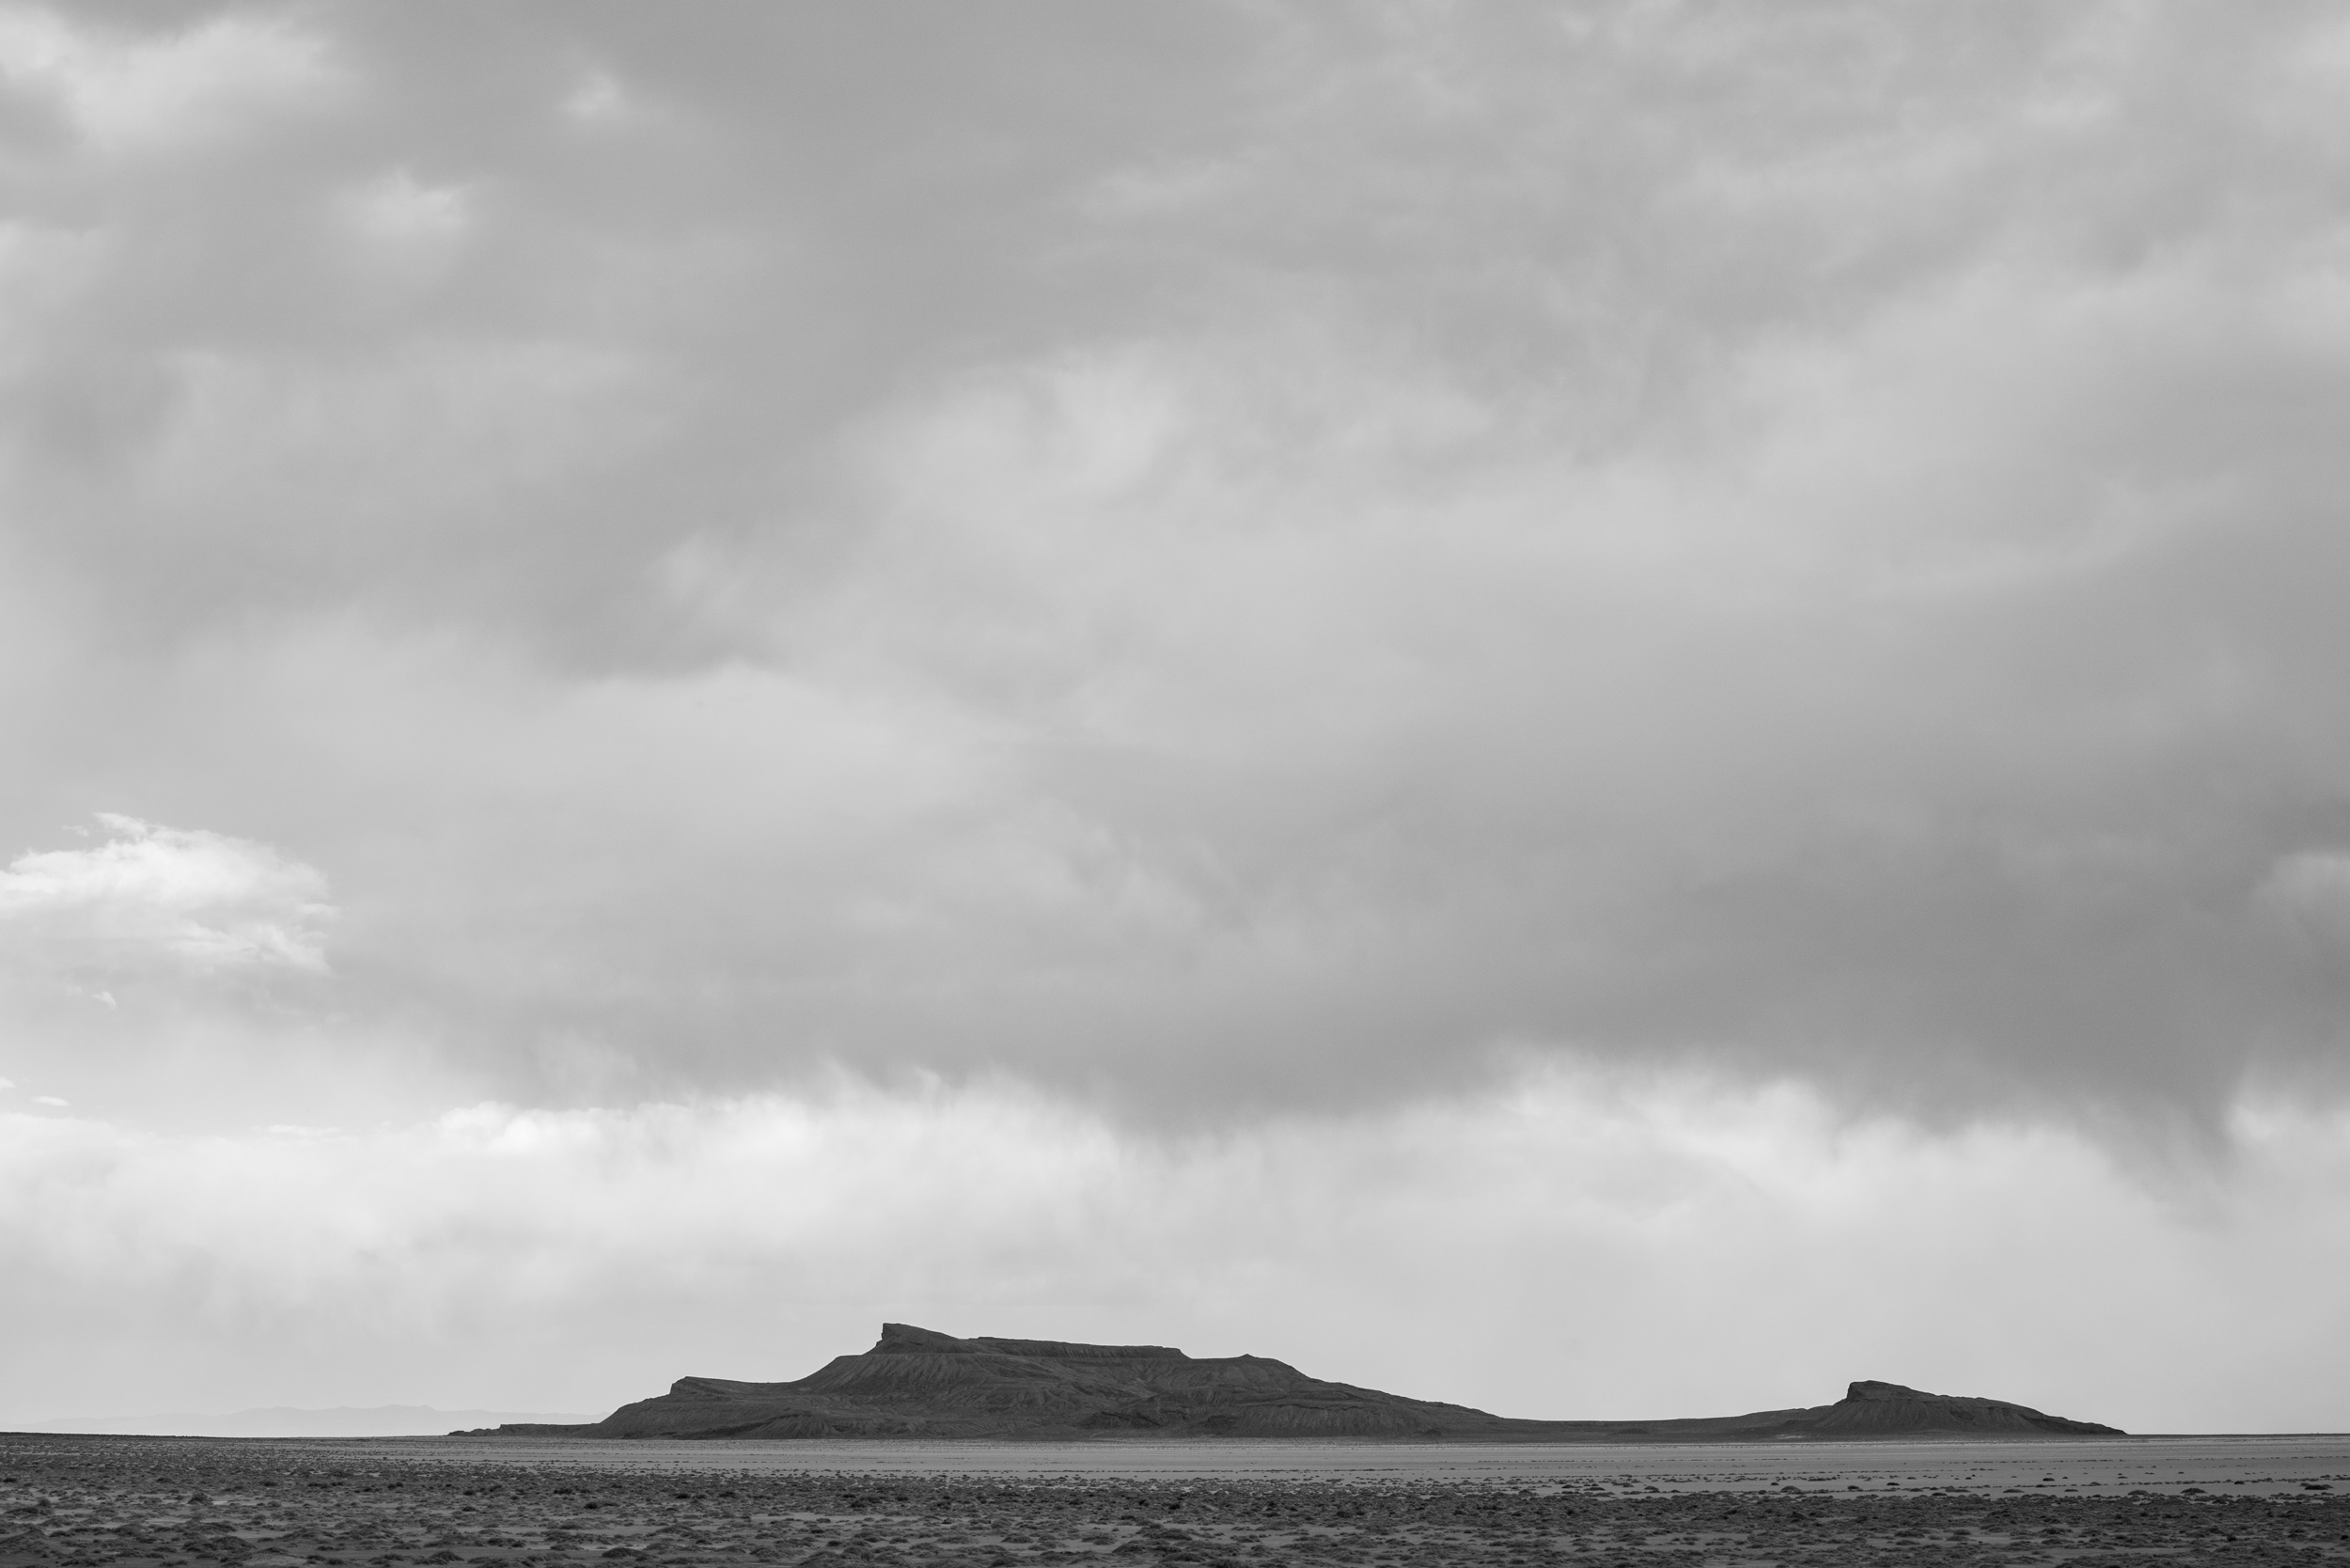 Floating Island near Silver Island Range, Utah. As ice-age Lake Bonneville dried up it left shoreline erosion markings, terraces, on the landscape in the Great Basin.